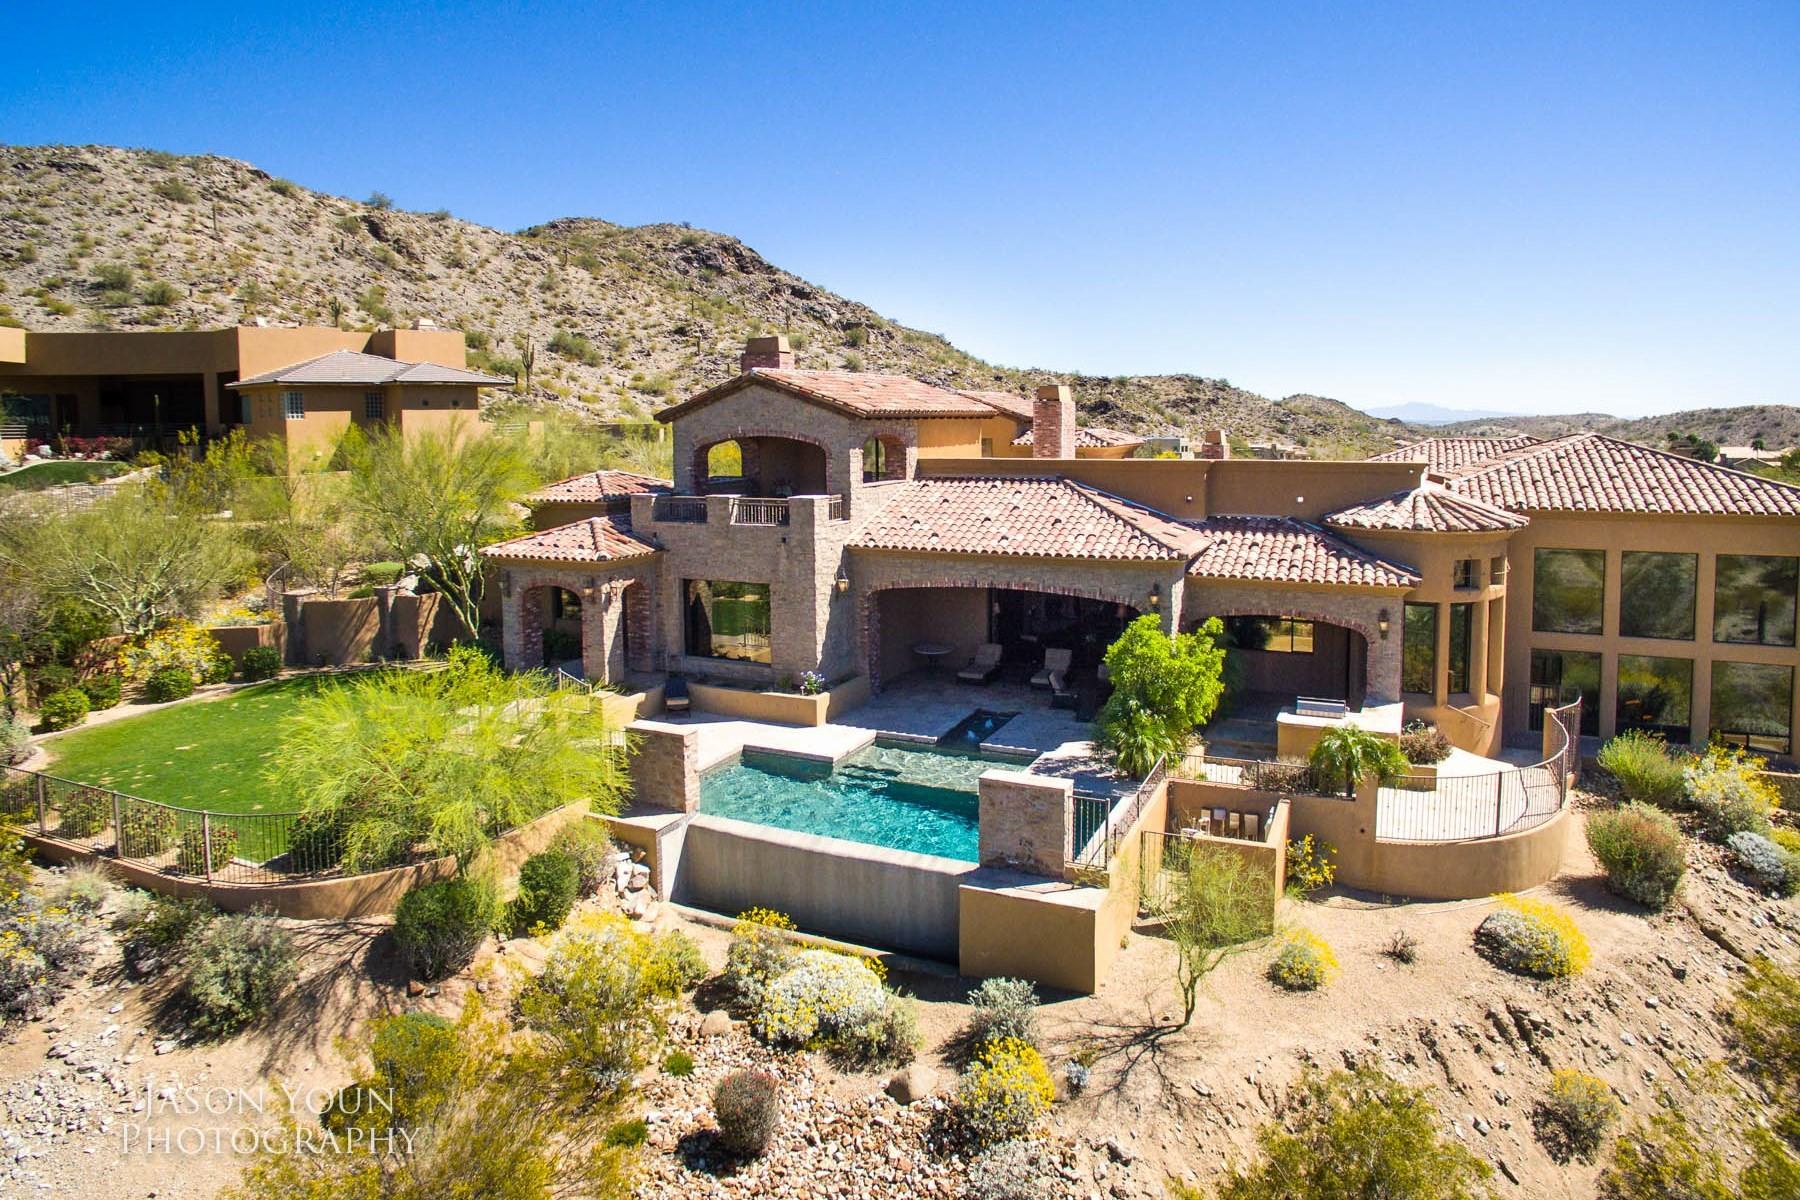 Villa per Vendita alle ore Hilltop custom Tuscan home in the gated community of Canyon Reserve 13808 S Canyon Dr Phoenix, Arizona, 85048 Stati Uniti